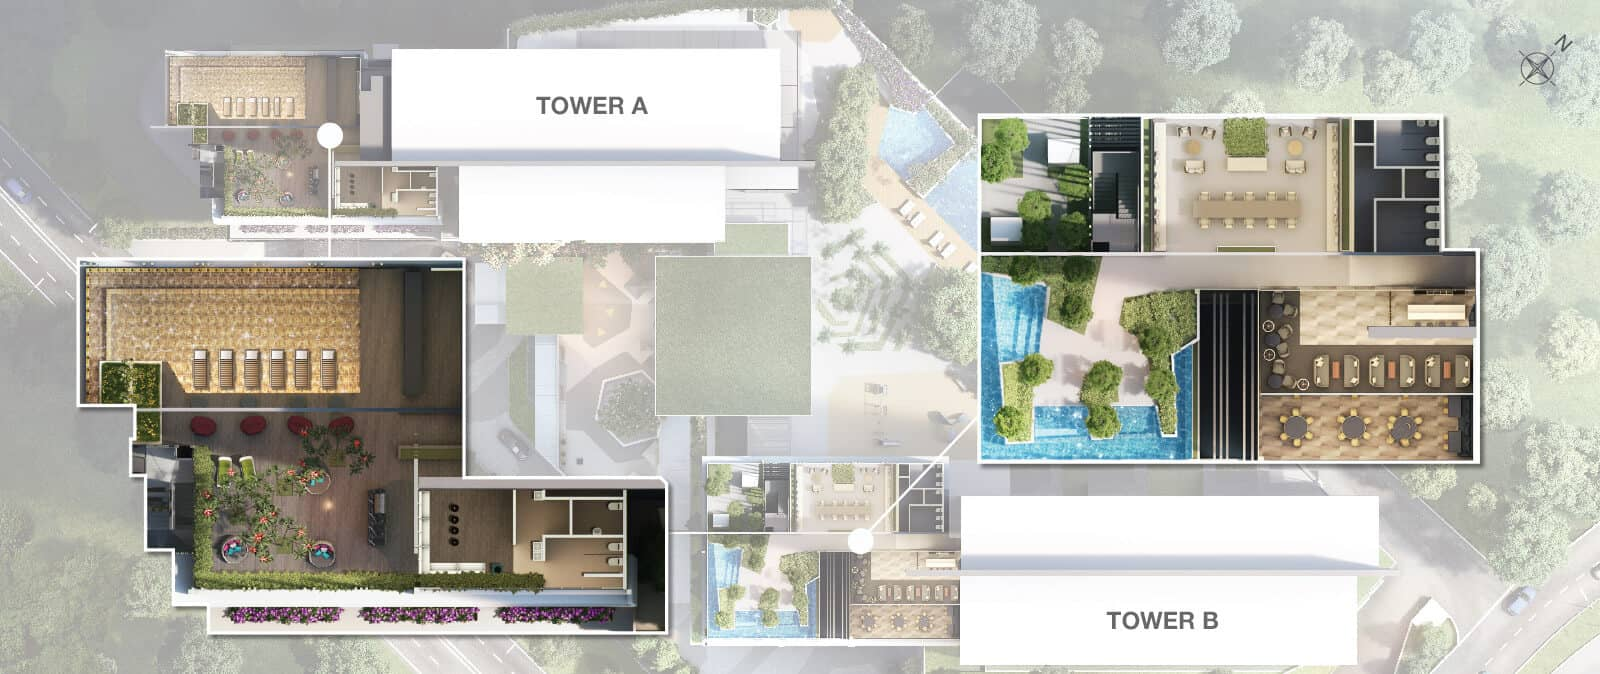 Facilities Plan of Rooftop